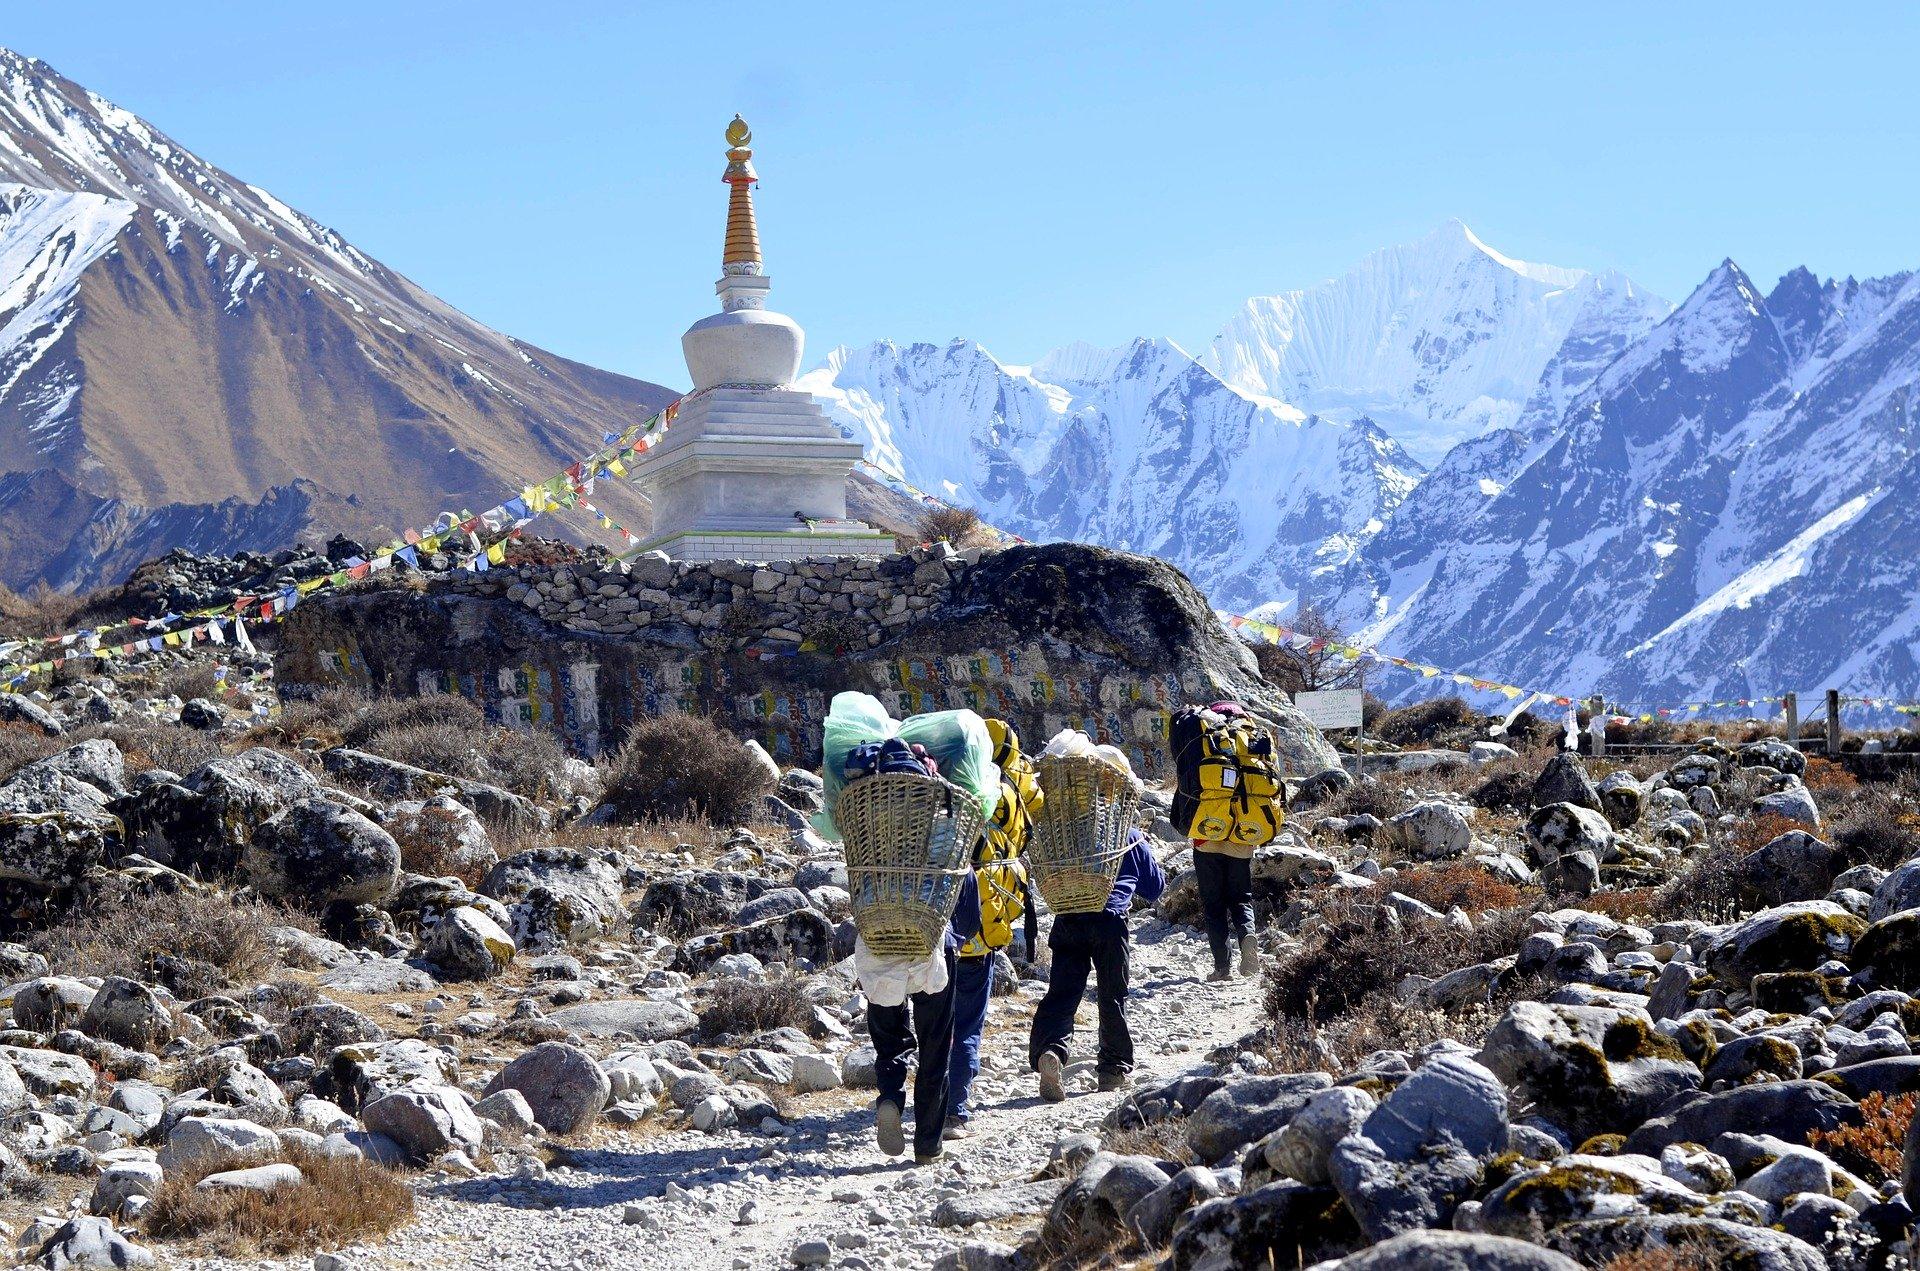 Langtang Ganja La Pass Trekking in Nepal